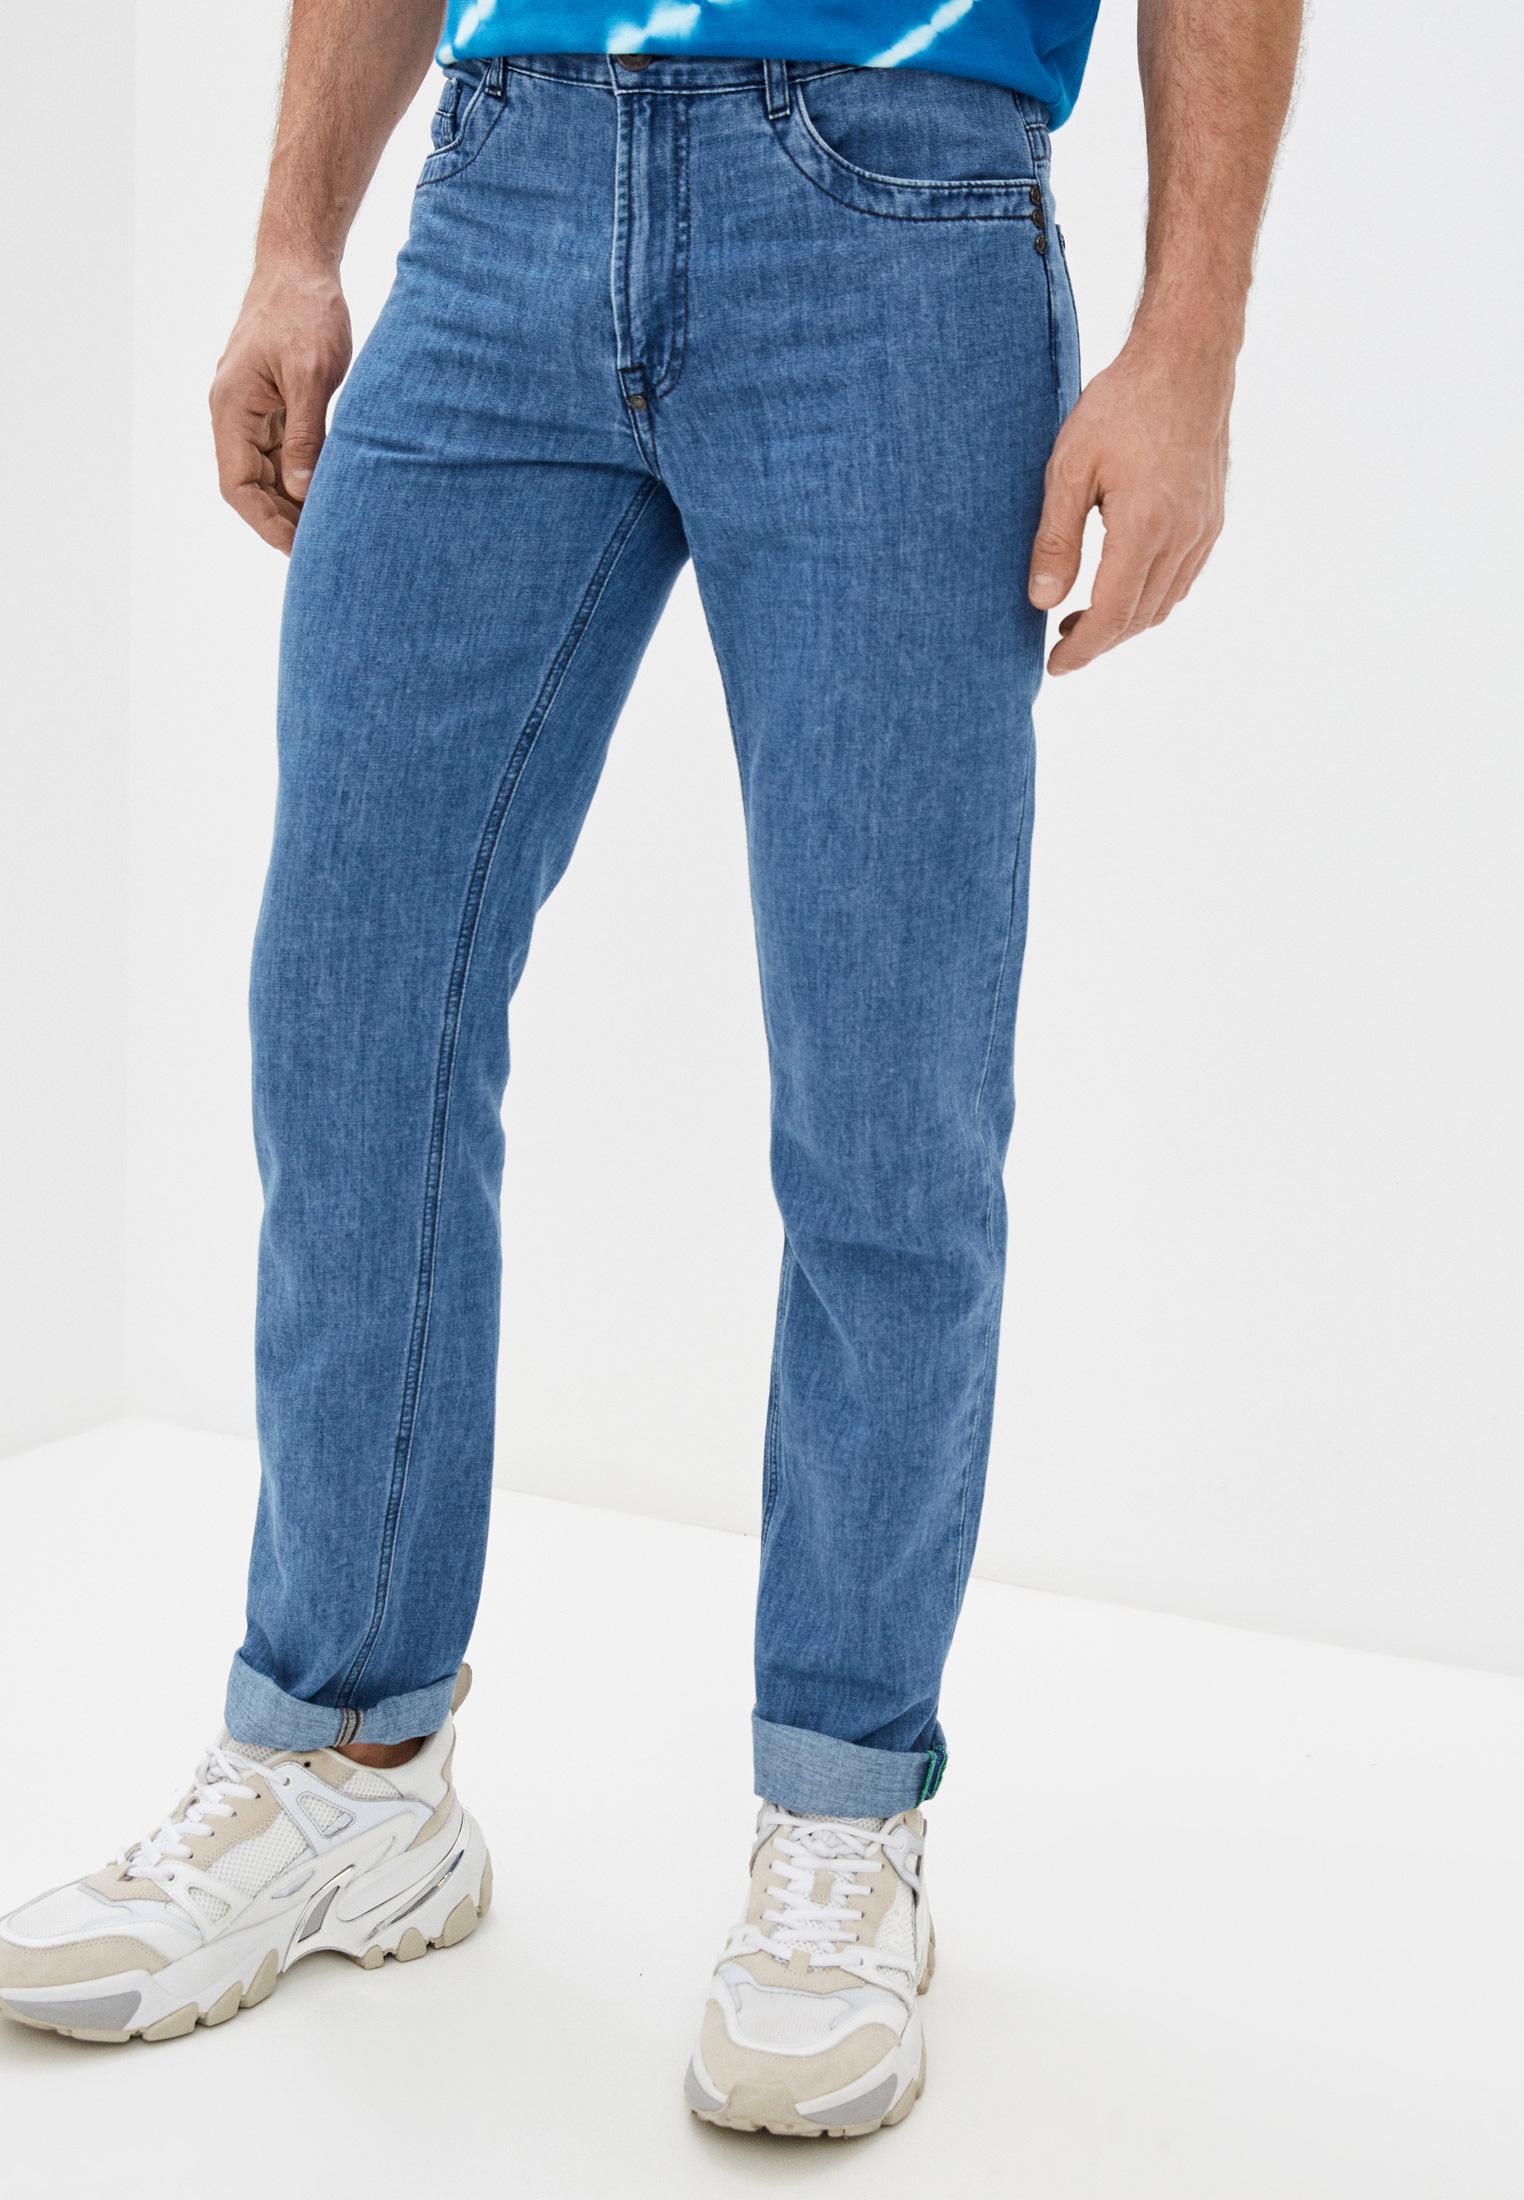 Зауженные джинсы Bikkembergs C Q 102 18 T 093A